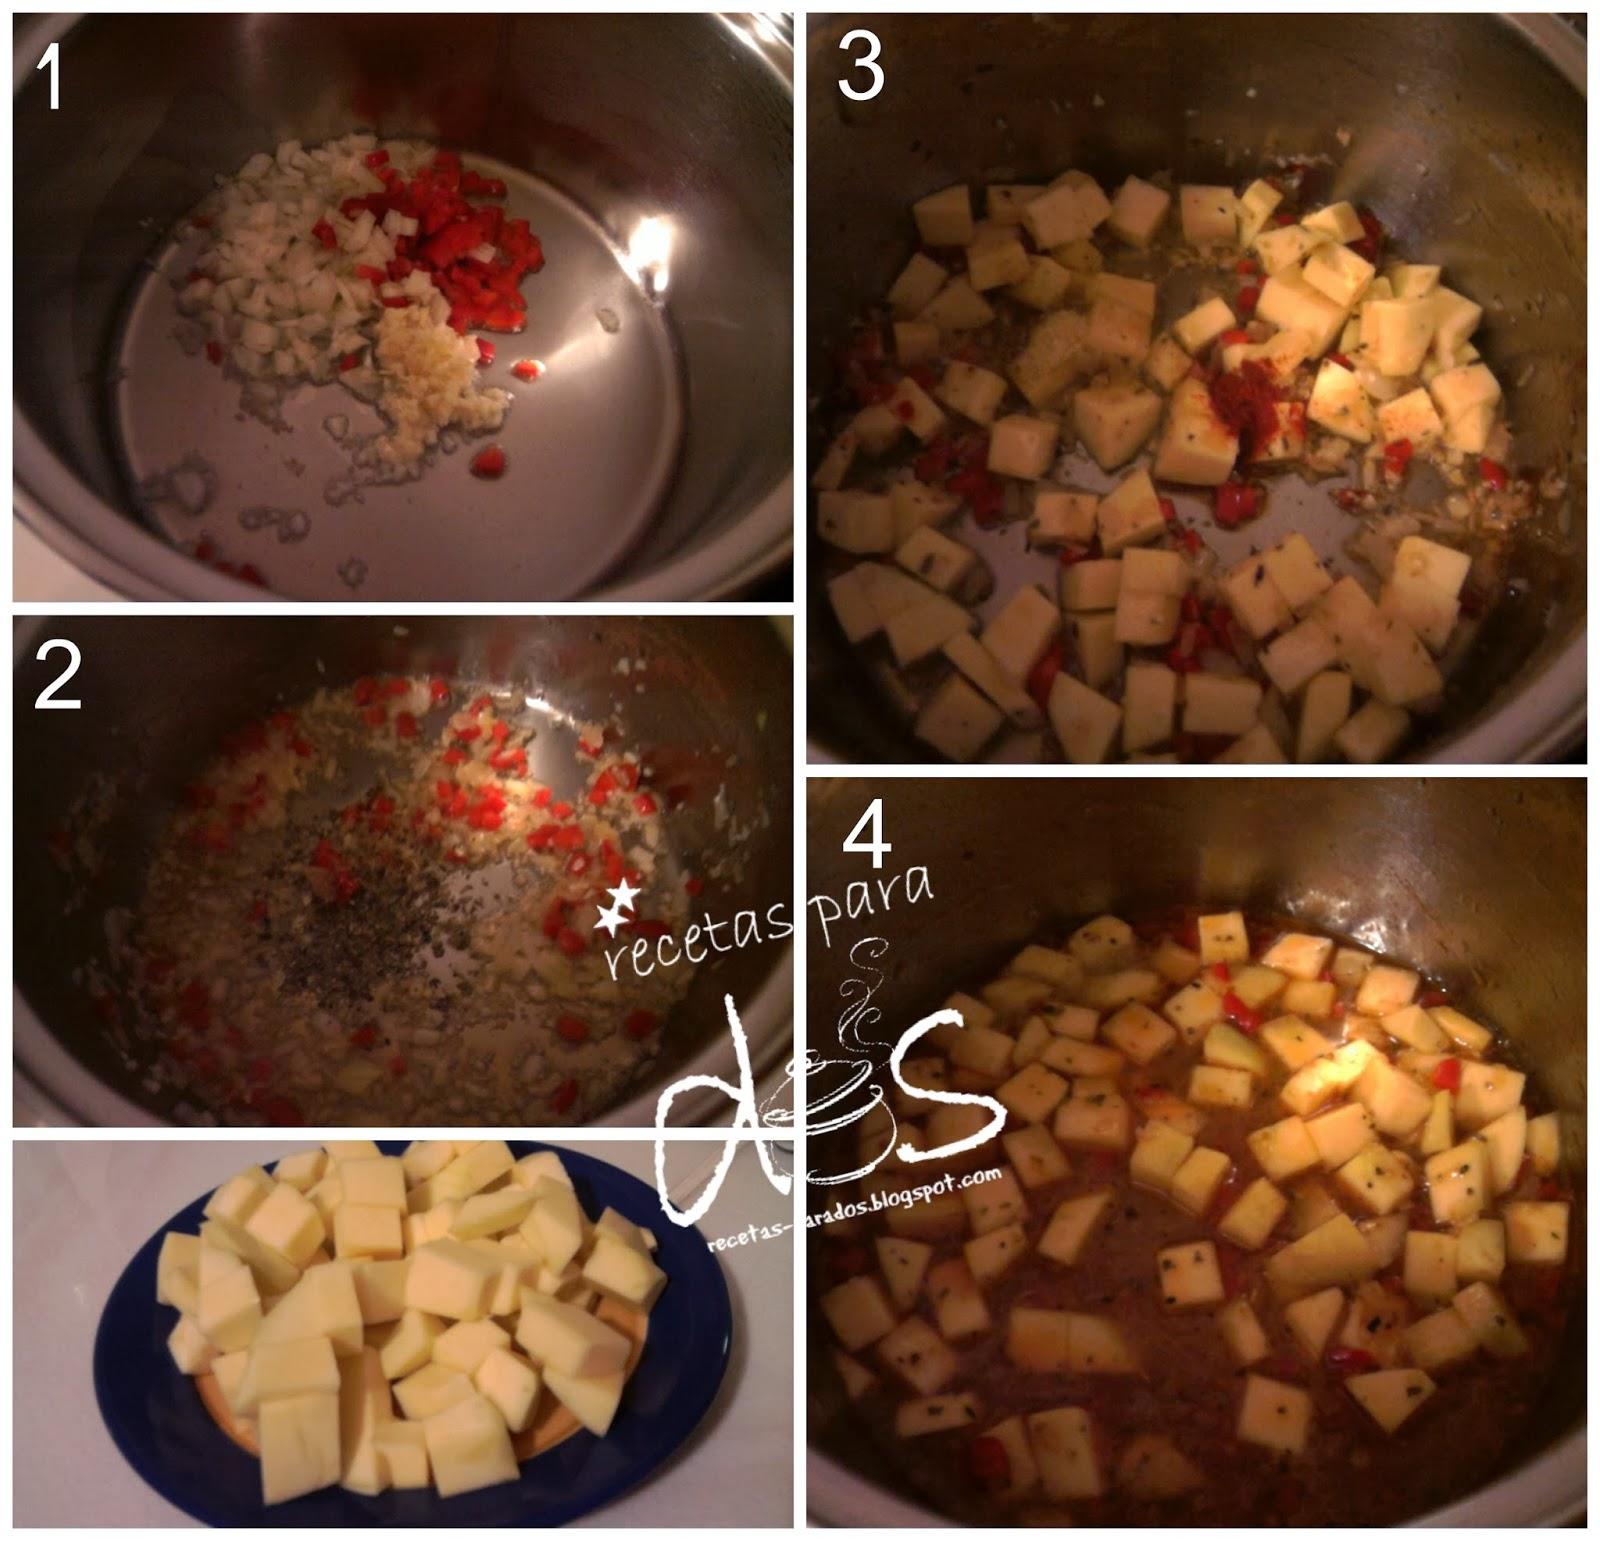 Recetas para dos espaguetis con pollo y ayote for Espaguetis para dos